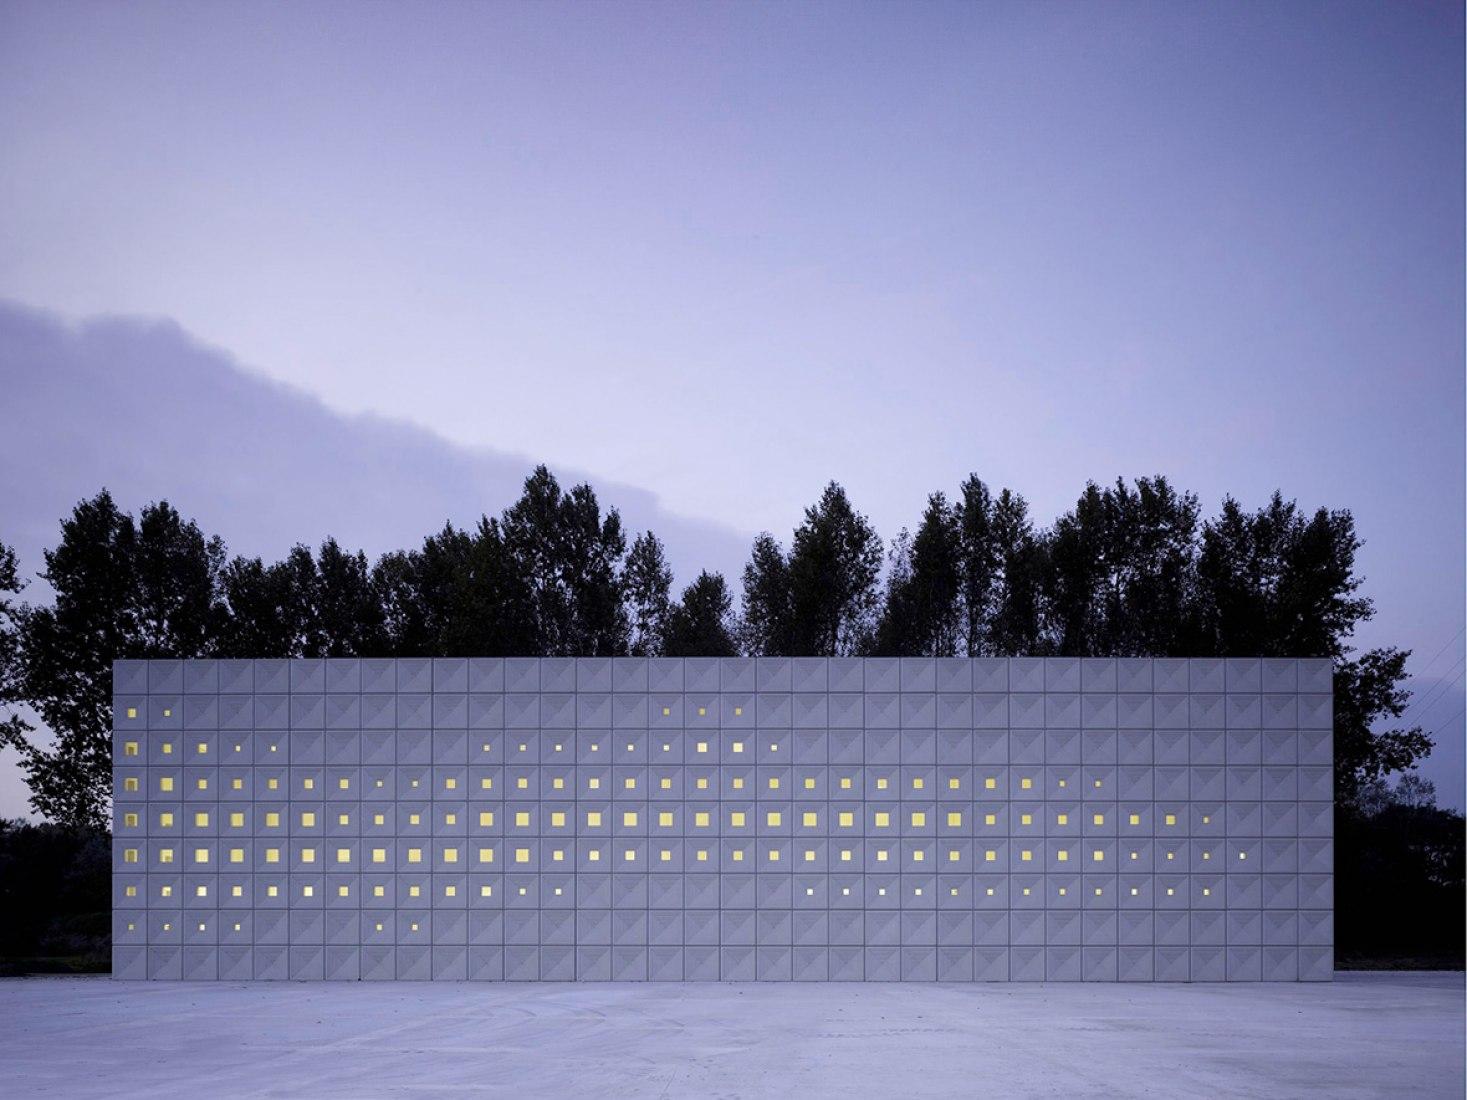 Vista exterior del crematorio Heimolen por KAAN Architecten. Fotografía © Christian Richters.